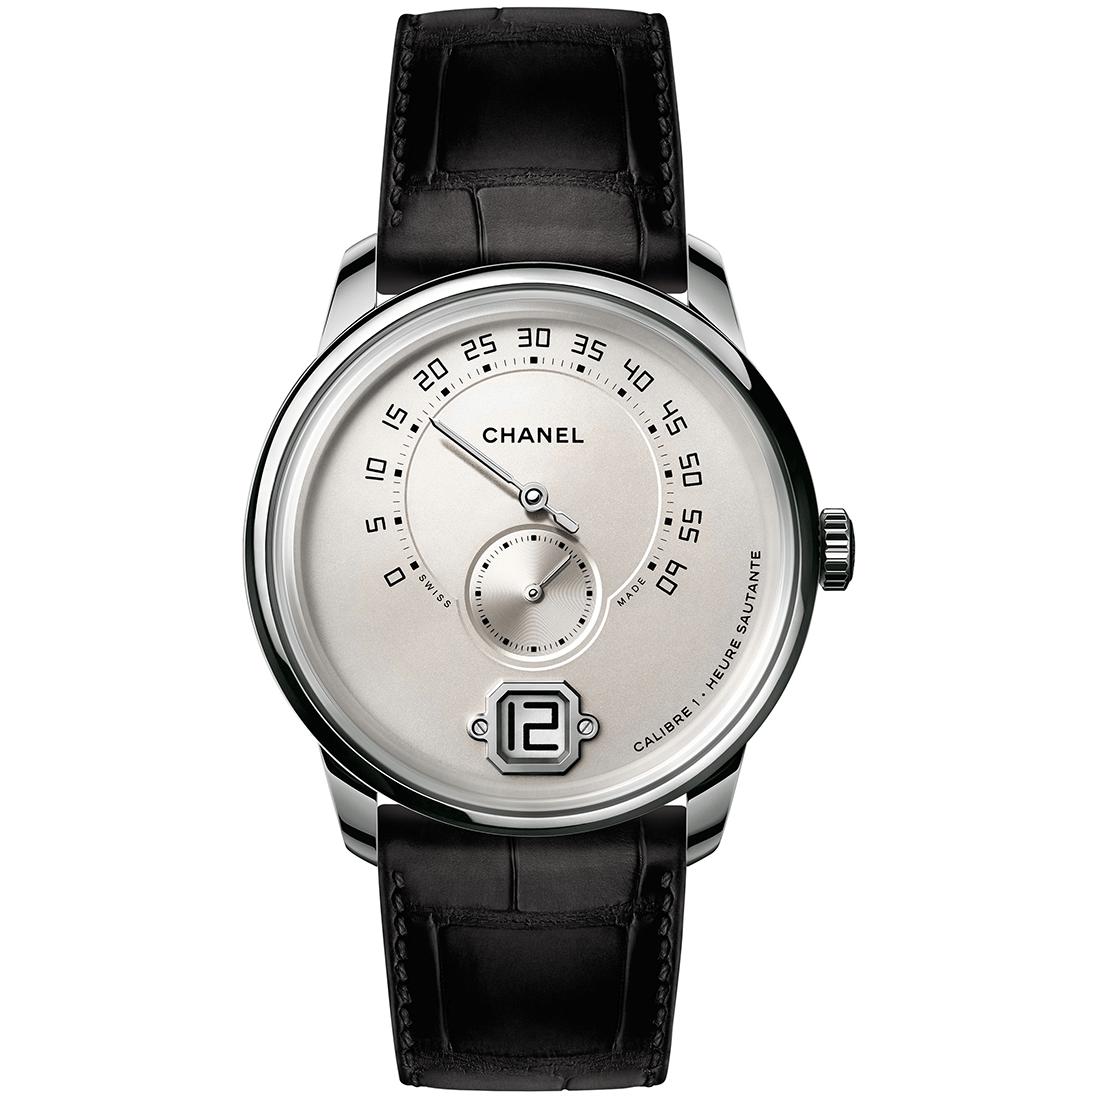 Chanel Monsieur white gold watch for men